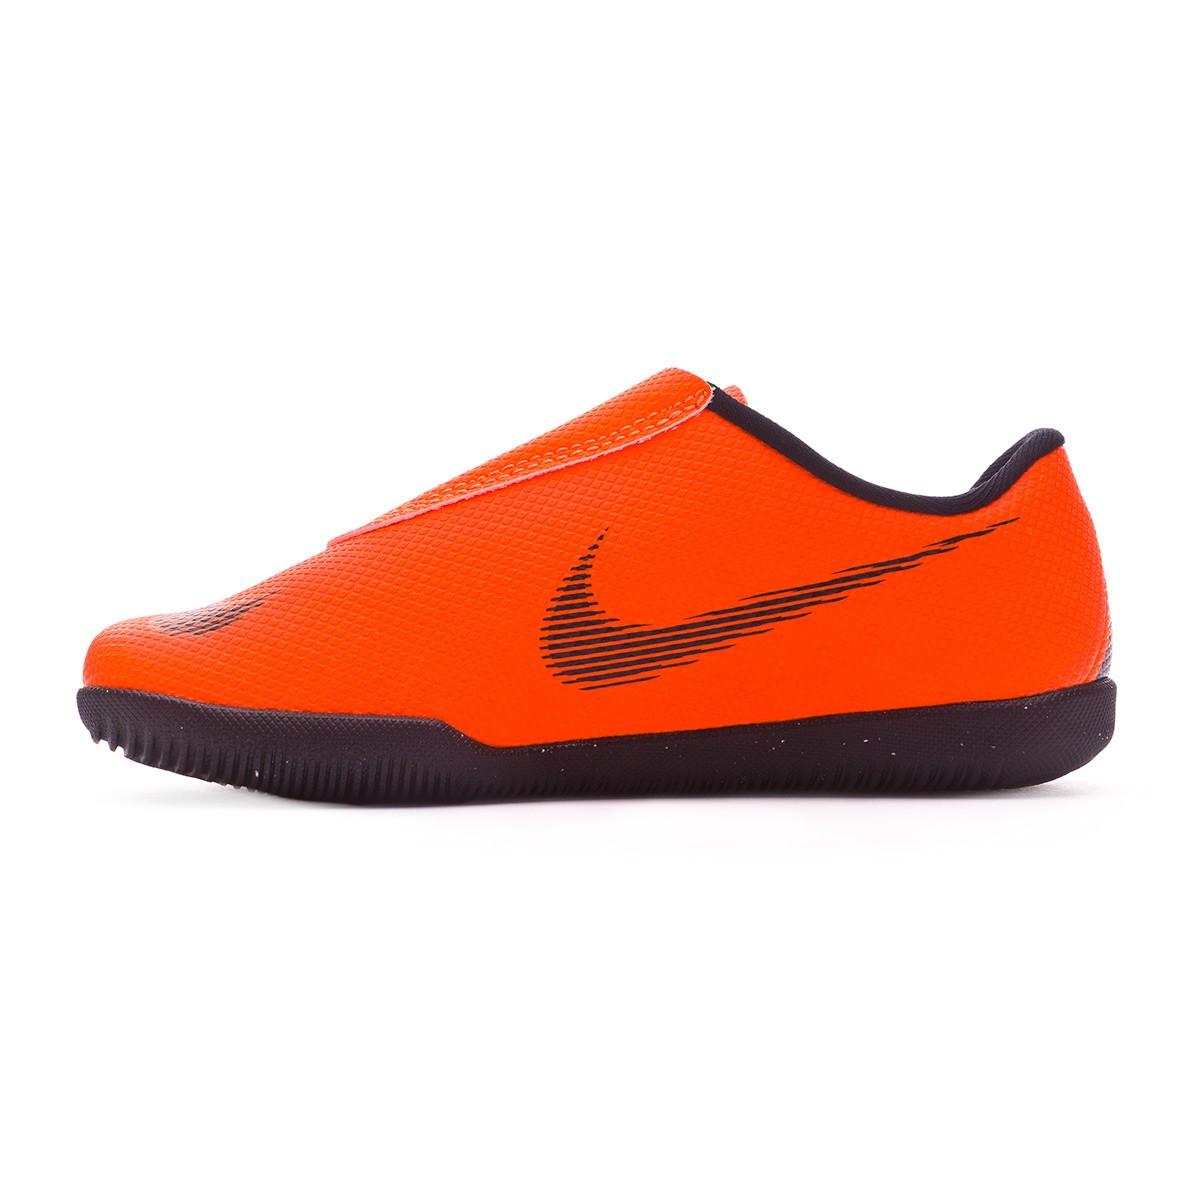 03a33f637bf2 Futsal Boot Nike Mercurial VaporX XII Club PS Velcro IC Kids Total orange- Black-Volt - Football store Fútbol Emotion